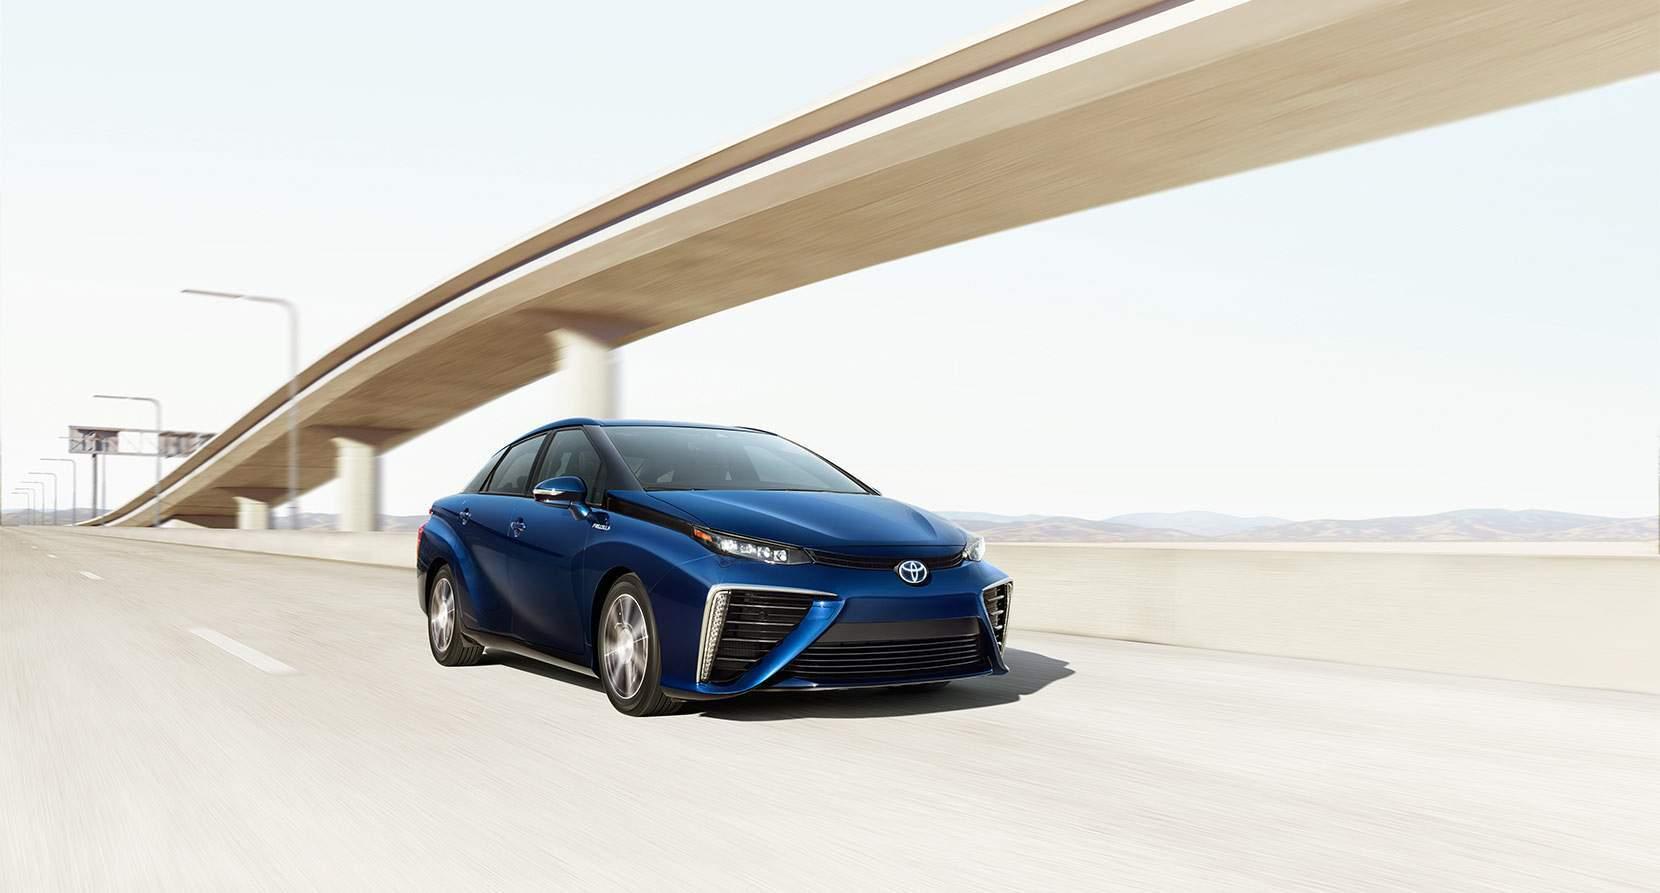 2017 Toyota Mirai For Sale